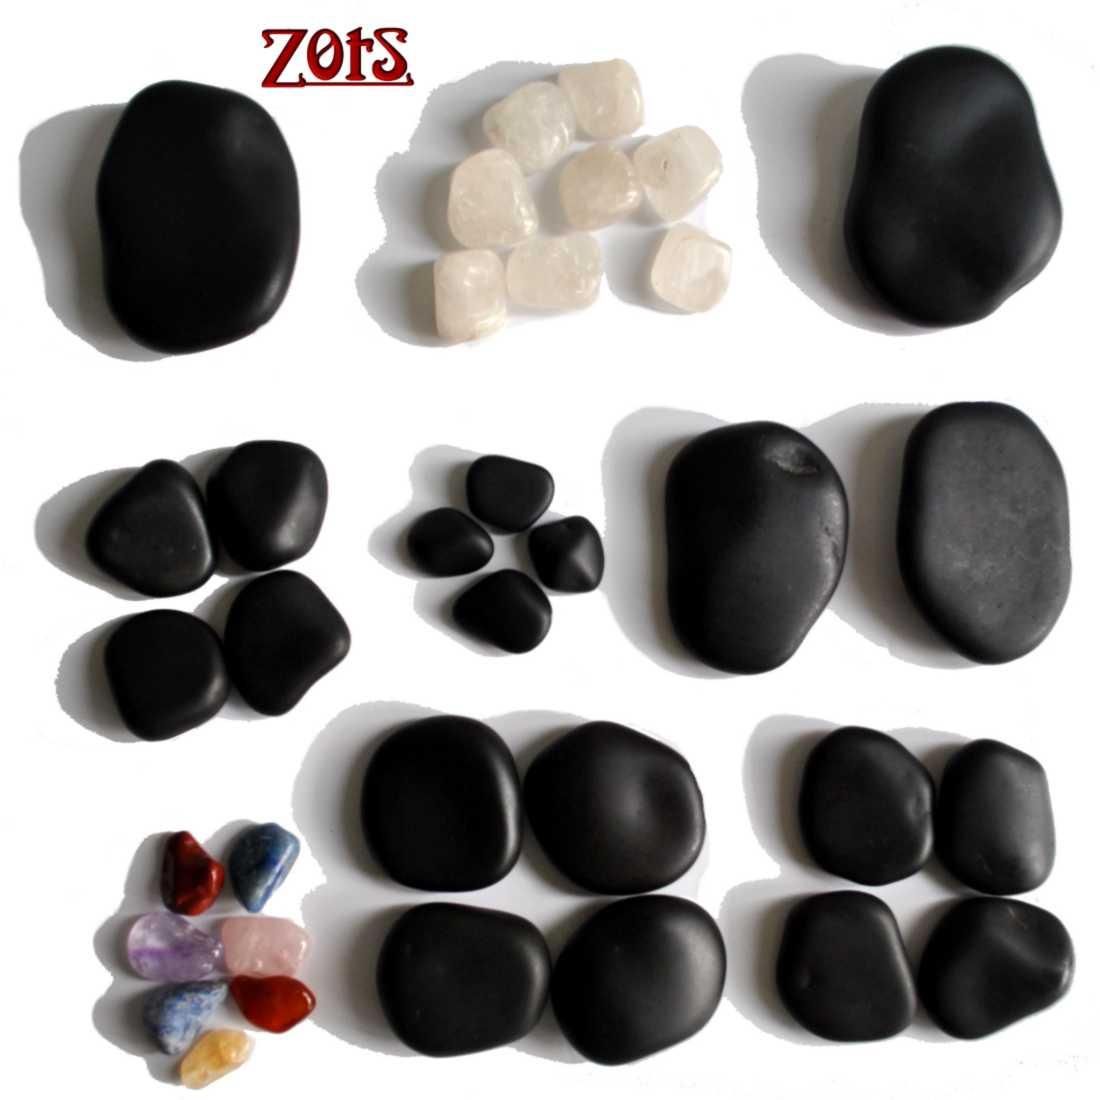 Kit 35 Pedras Quentes Basalto Vulcânico  -  Zots